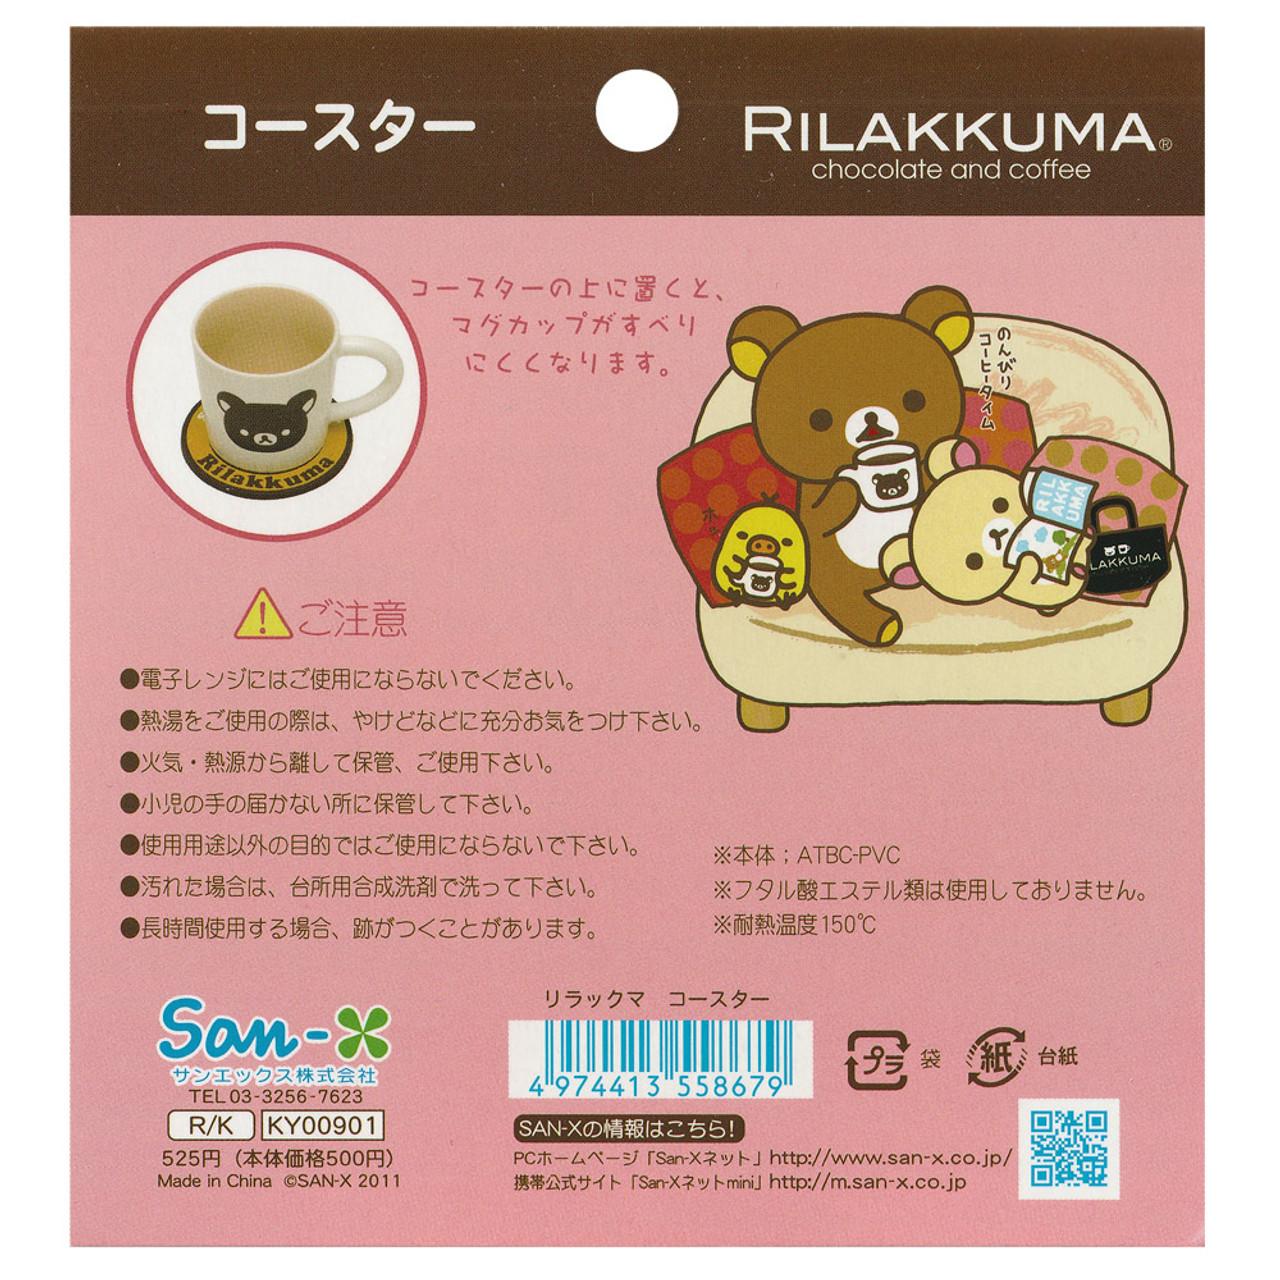 San-x Rilakkuma Circle Chocolate Coffee Cup Coaster - KY00901 ( Packing Back View )